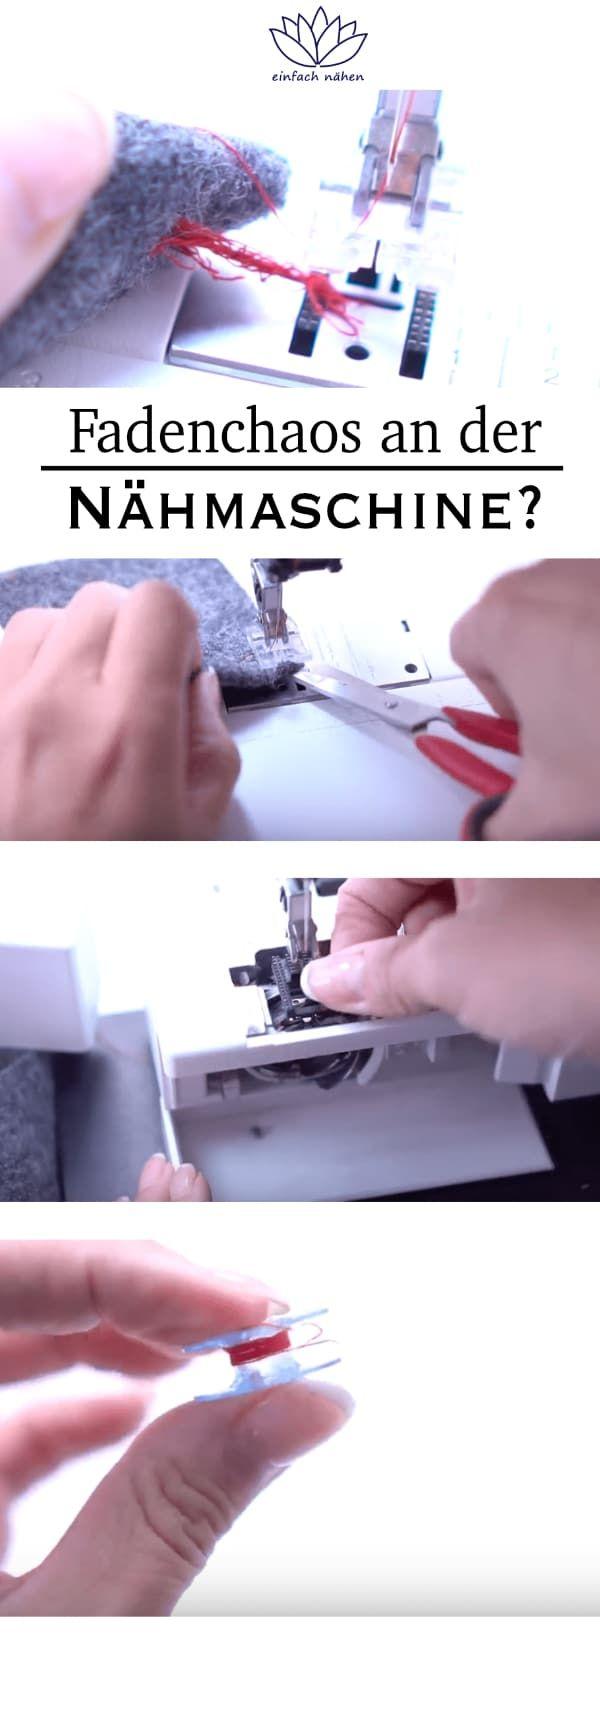 Photo of Fadenchaos an der Nähmaschine – 3 wertvolle Tipps | EINFACH NÄHEN | PREMIUM | INSPIRATION |